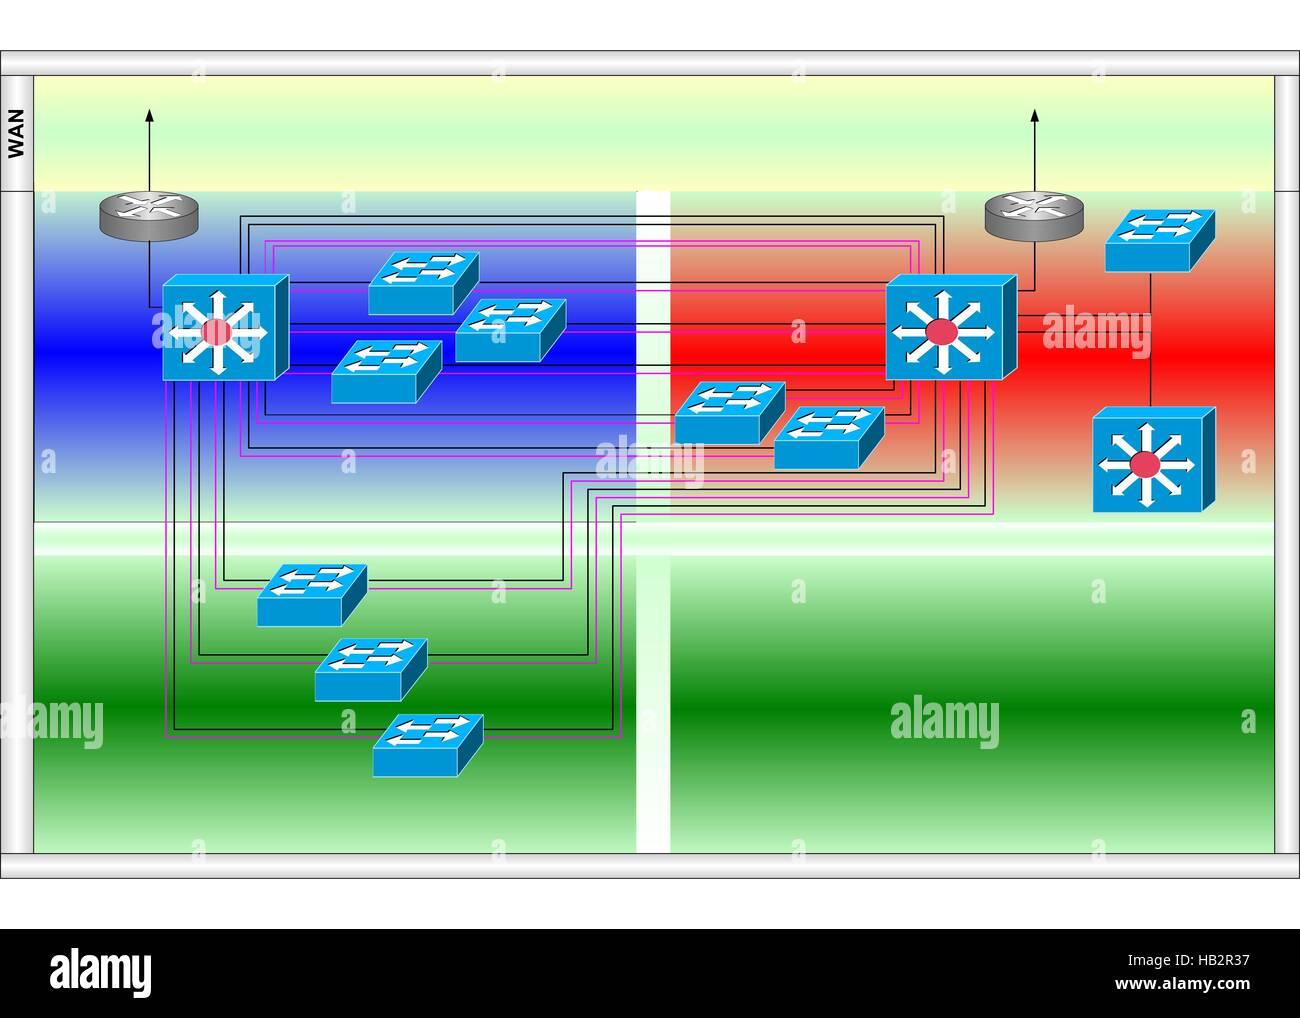 network wlan vlan diagram illustration HB2R37 network wlan vlan diagram illustration stock photo 127295819 alamy